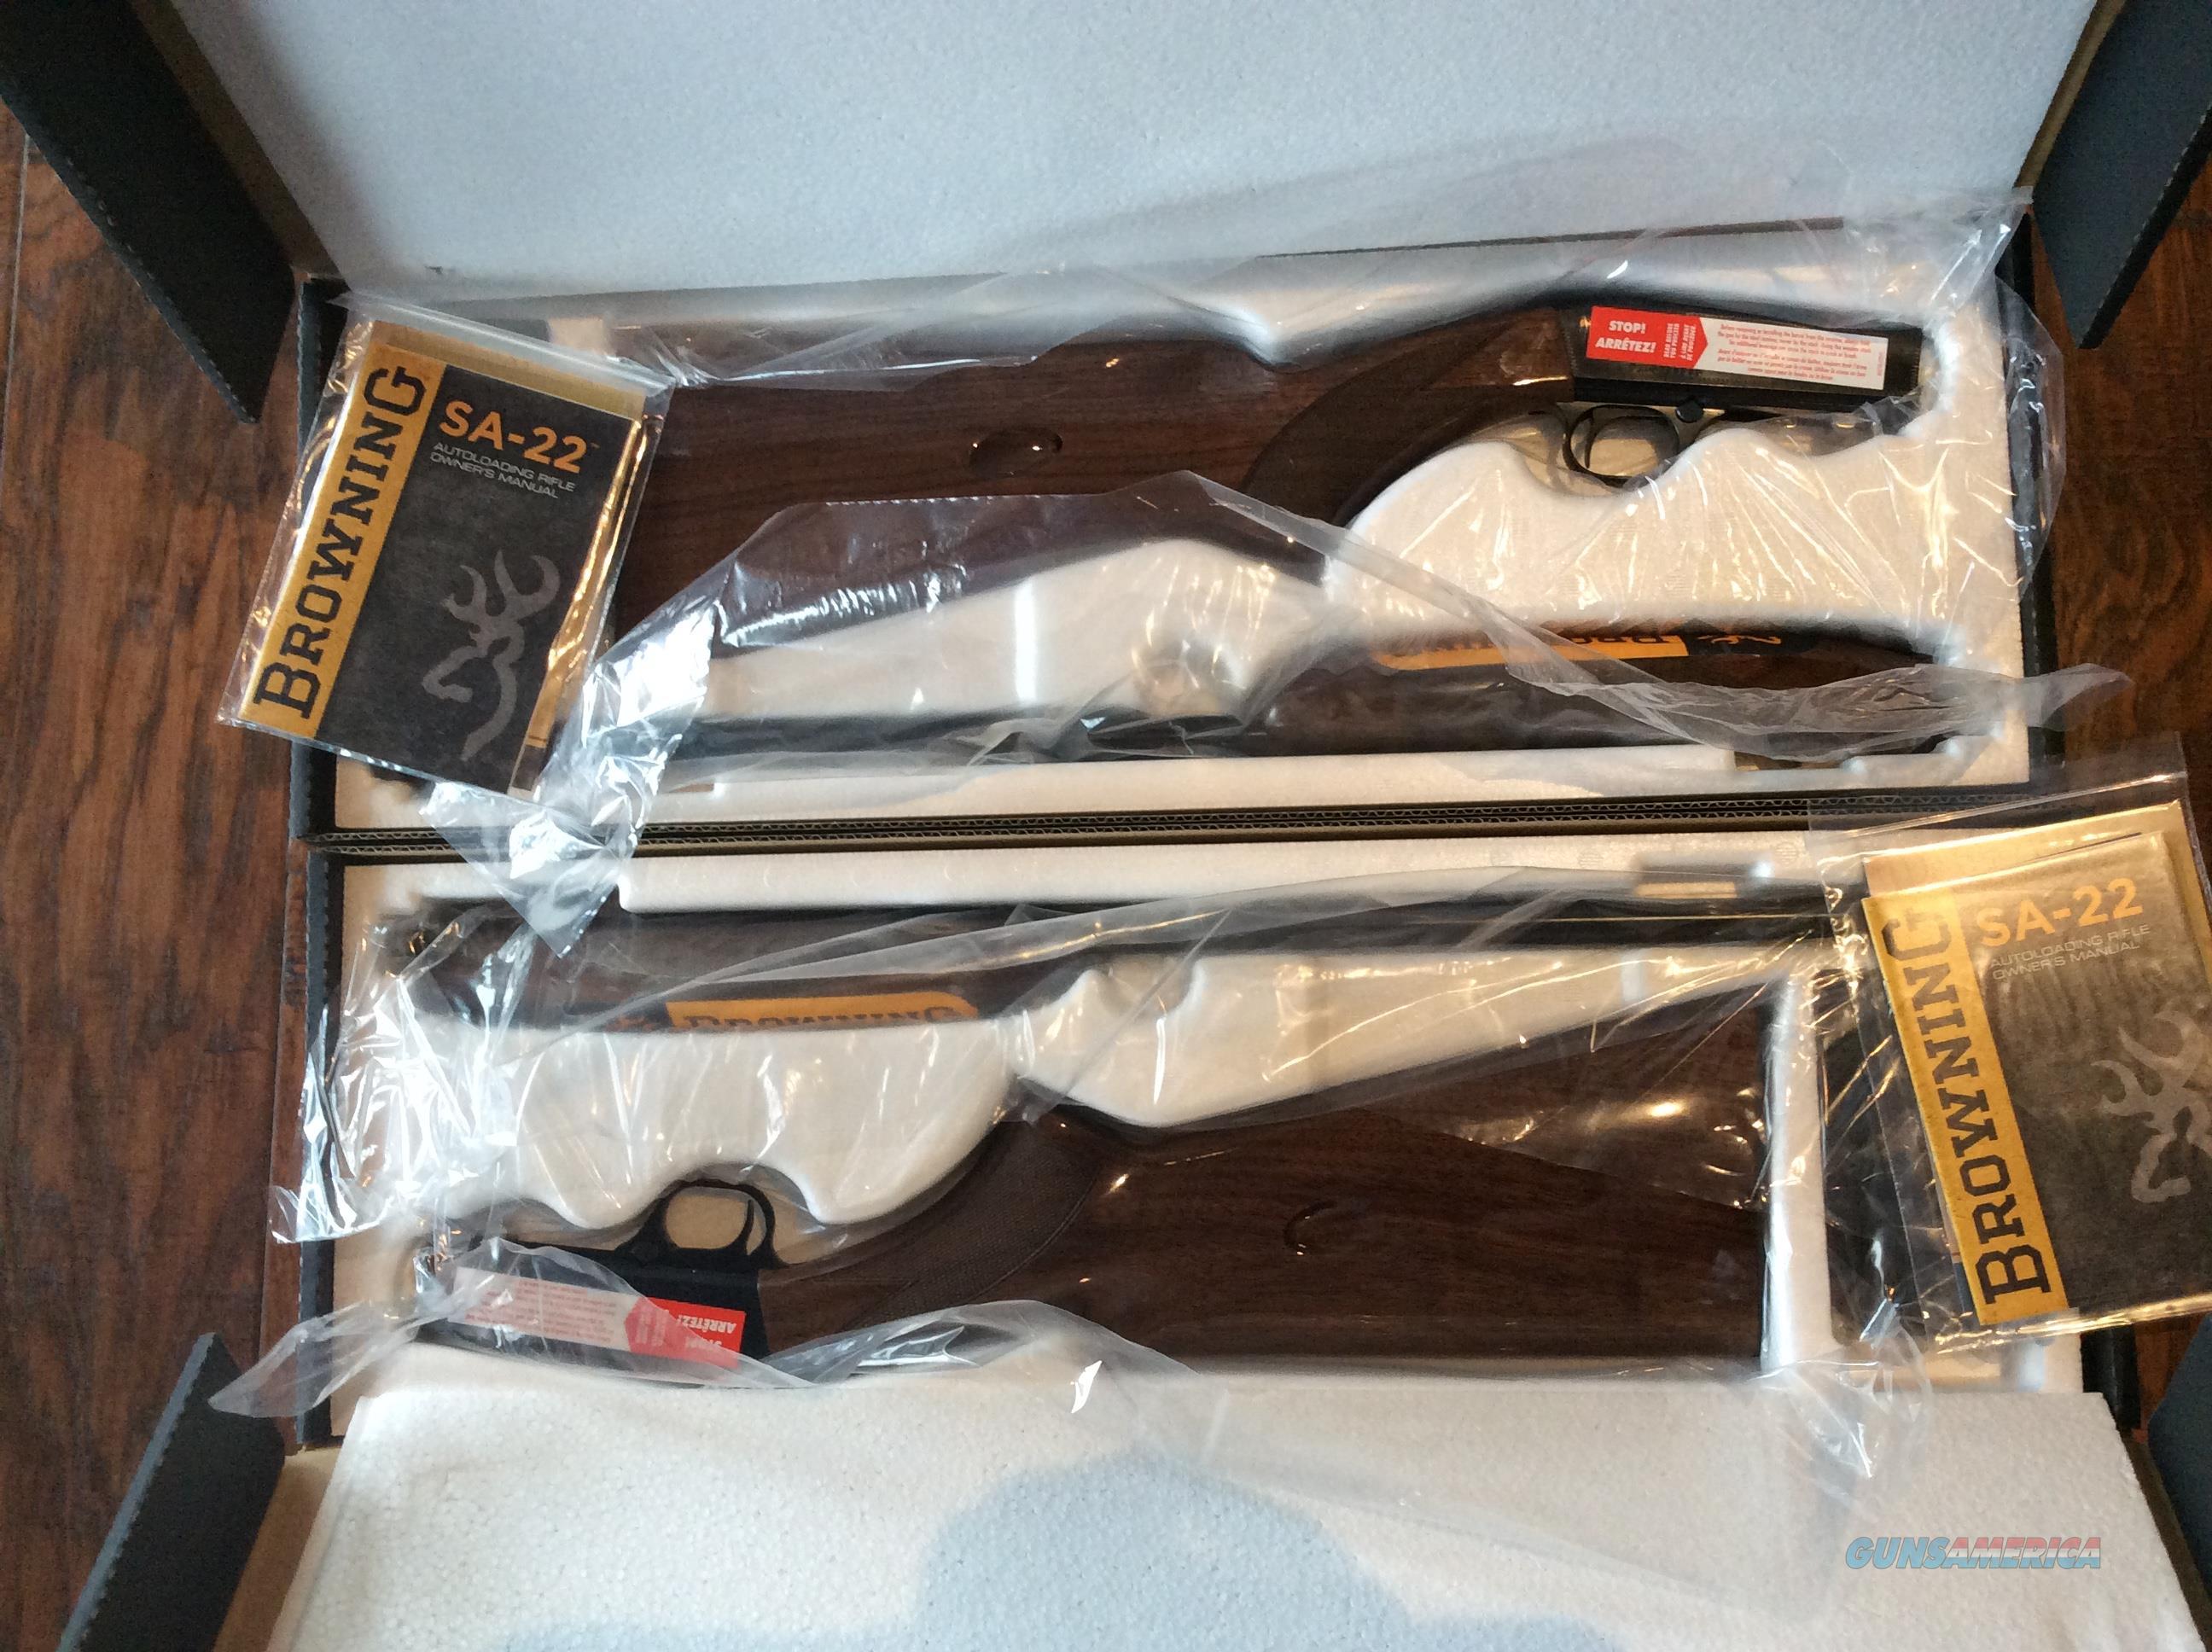 Pair of Browning sa-22 short only rifles with consecutive serial numbers  Guns > Rifles > Browning Rifles > Semi Auto > Hunting